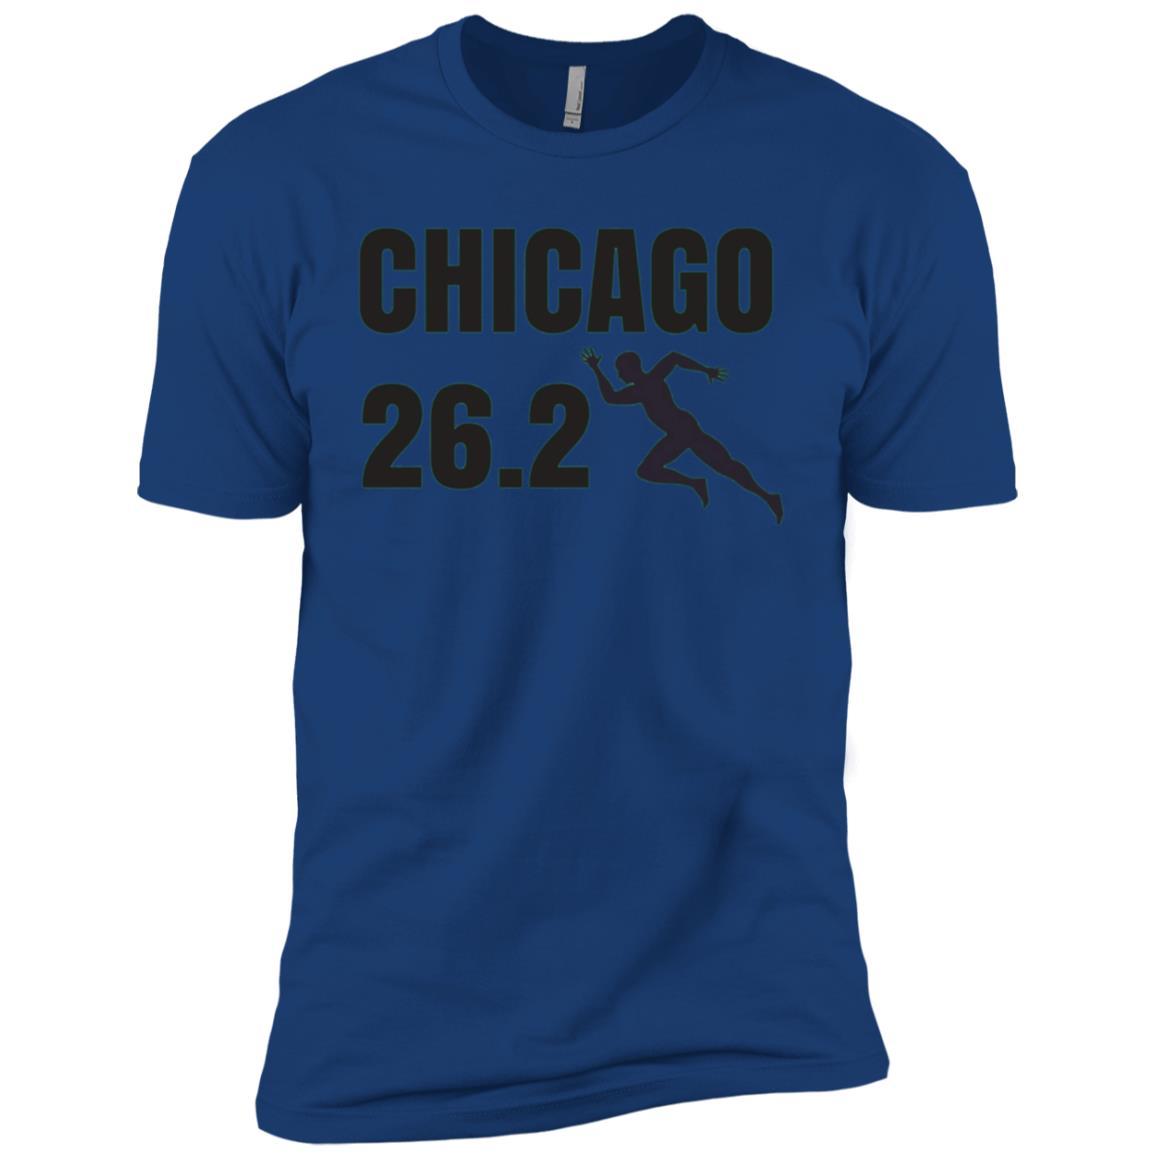 Chicago 26.2 Miles Marathon Running Men Short Sleeve T-Shirt